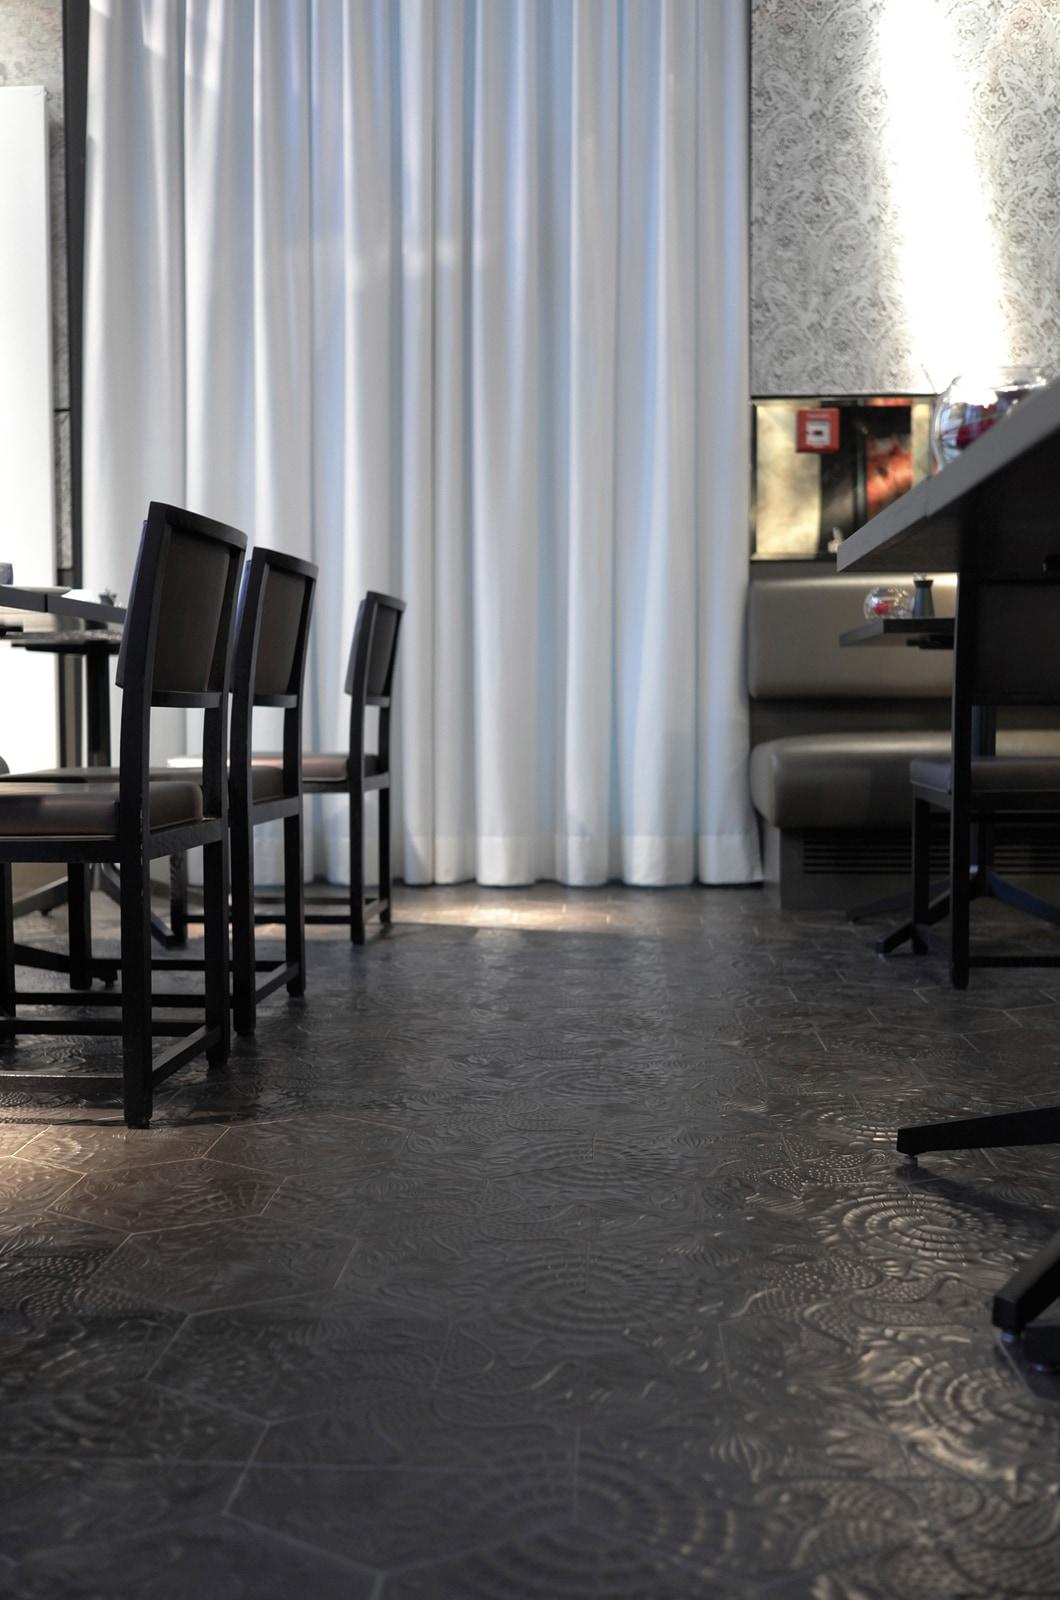 zementmosaikplatte-nummer-60G-hotel-sofitel-via-gmbh | N° 60G